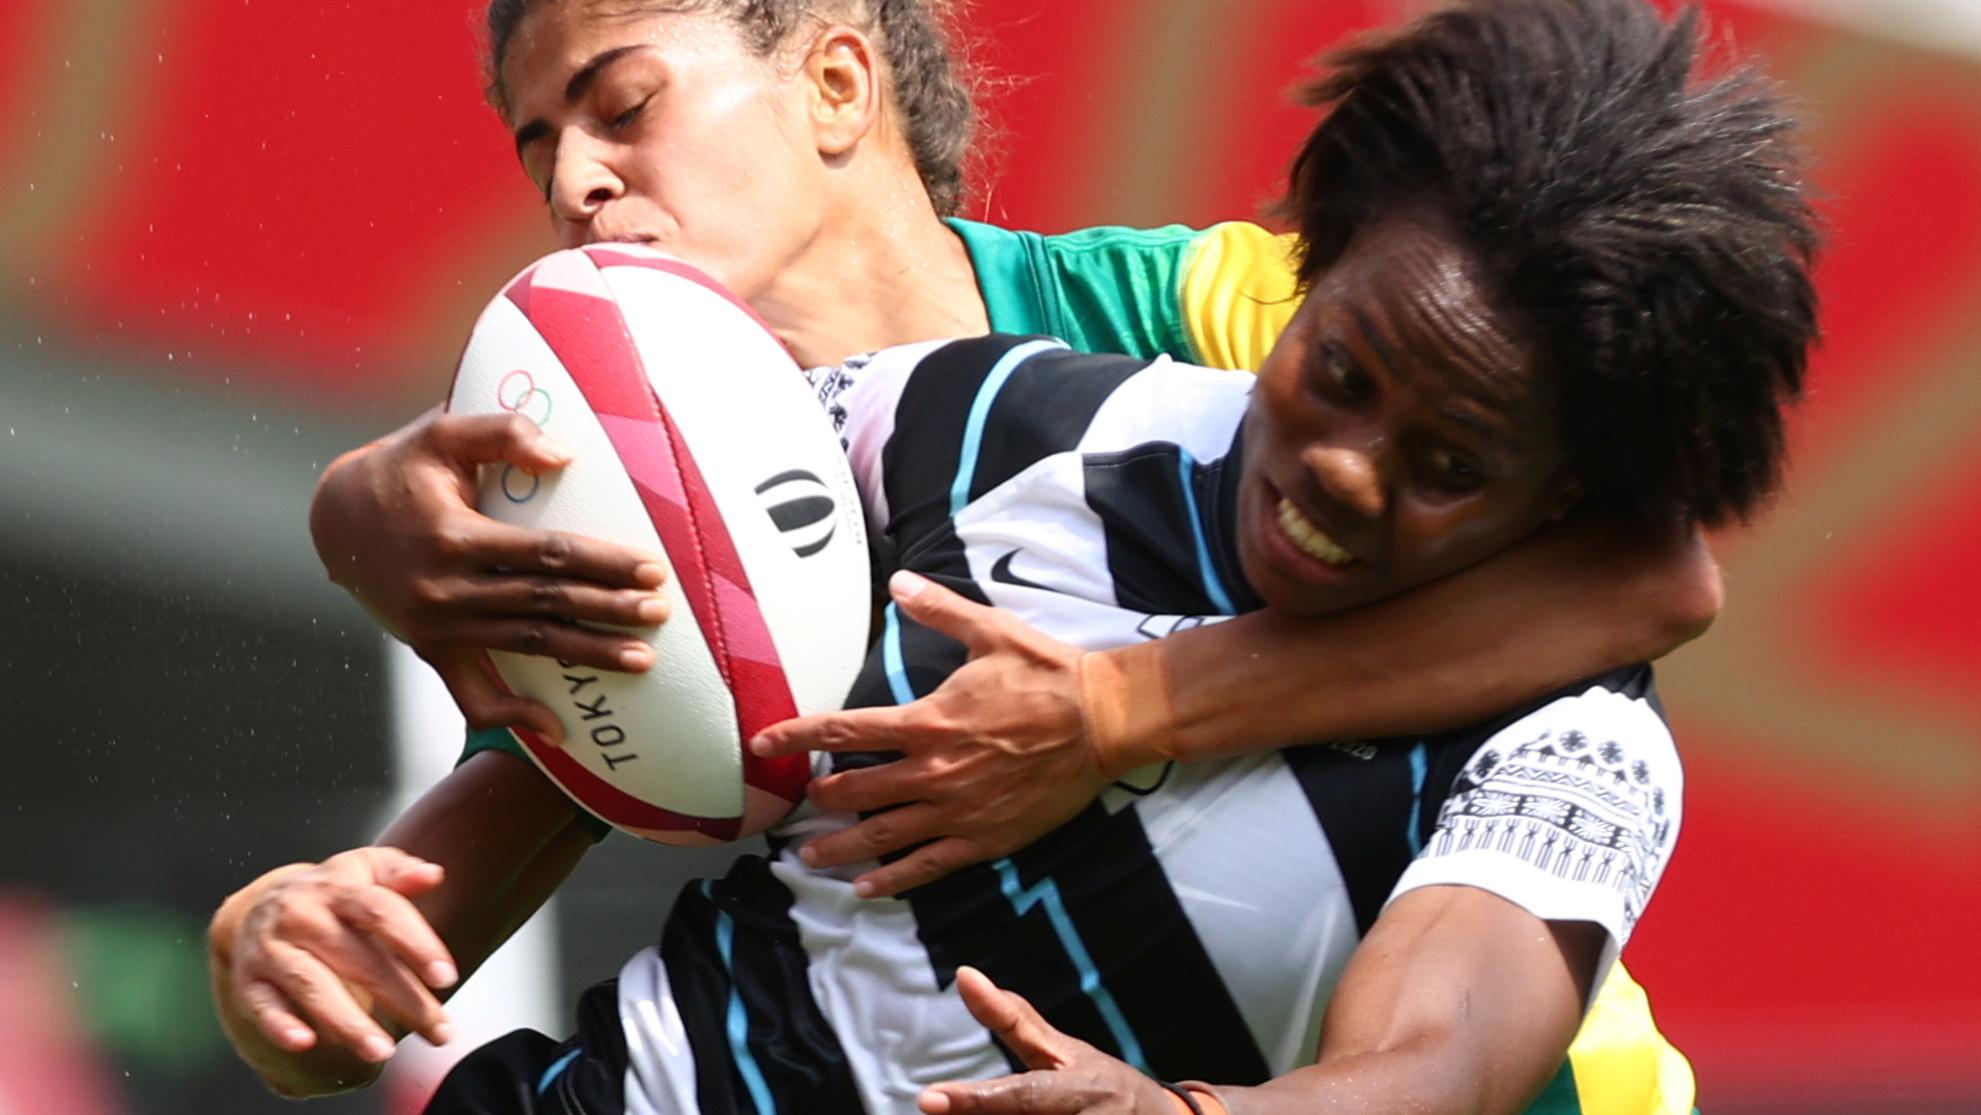 Tokyo 2020 Olympics - Rugby Sevens - Women - Pool B - Fiji v Brazil - Tokyo Stadium - Tokyo, Japan - July 30, 2021. Raijieli Daveua of Fiji in action with Bianca Silva of Brazil. REUTERS/Edgard Garrido - SP1EH7U01BH6A